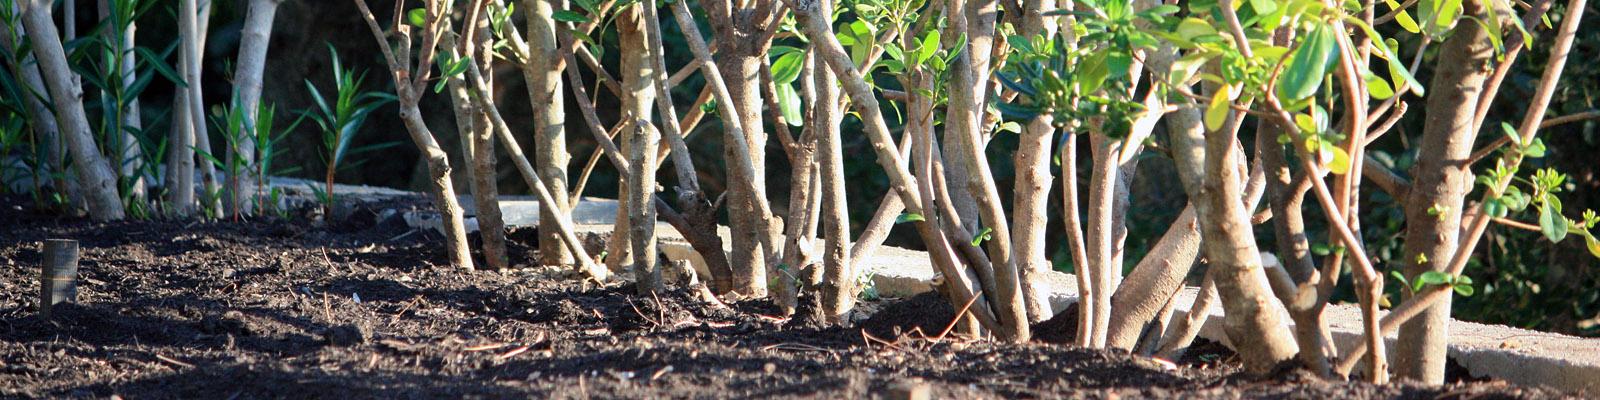 Green Parrot Gardens | Garden Renovation